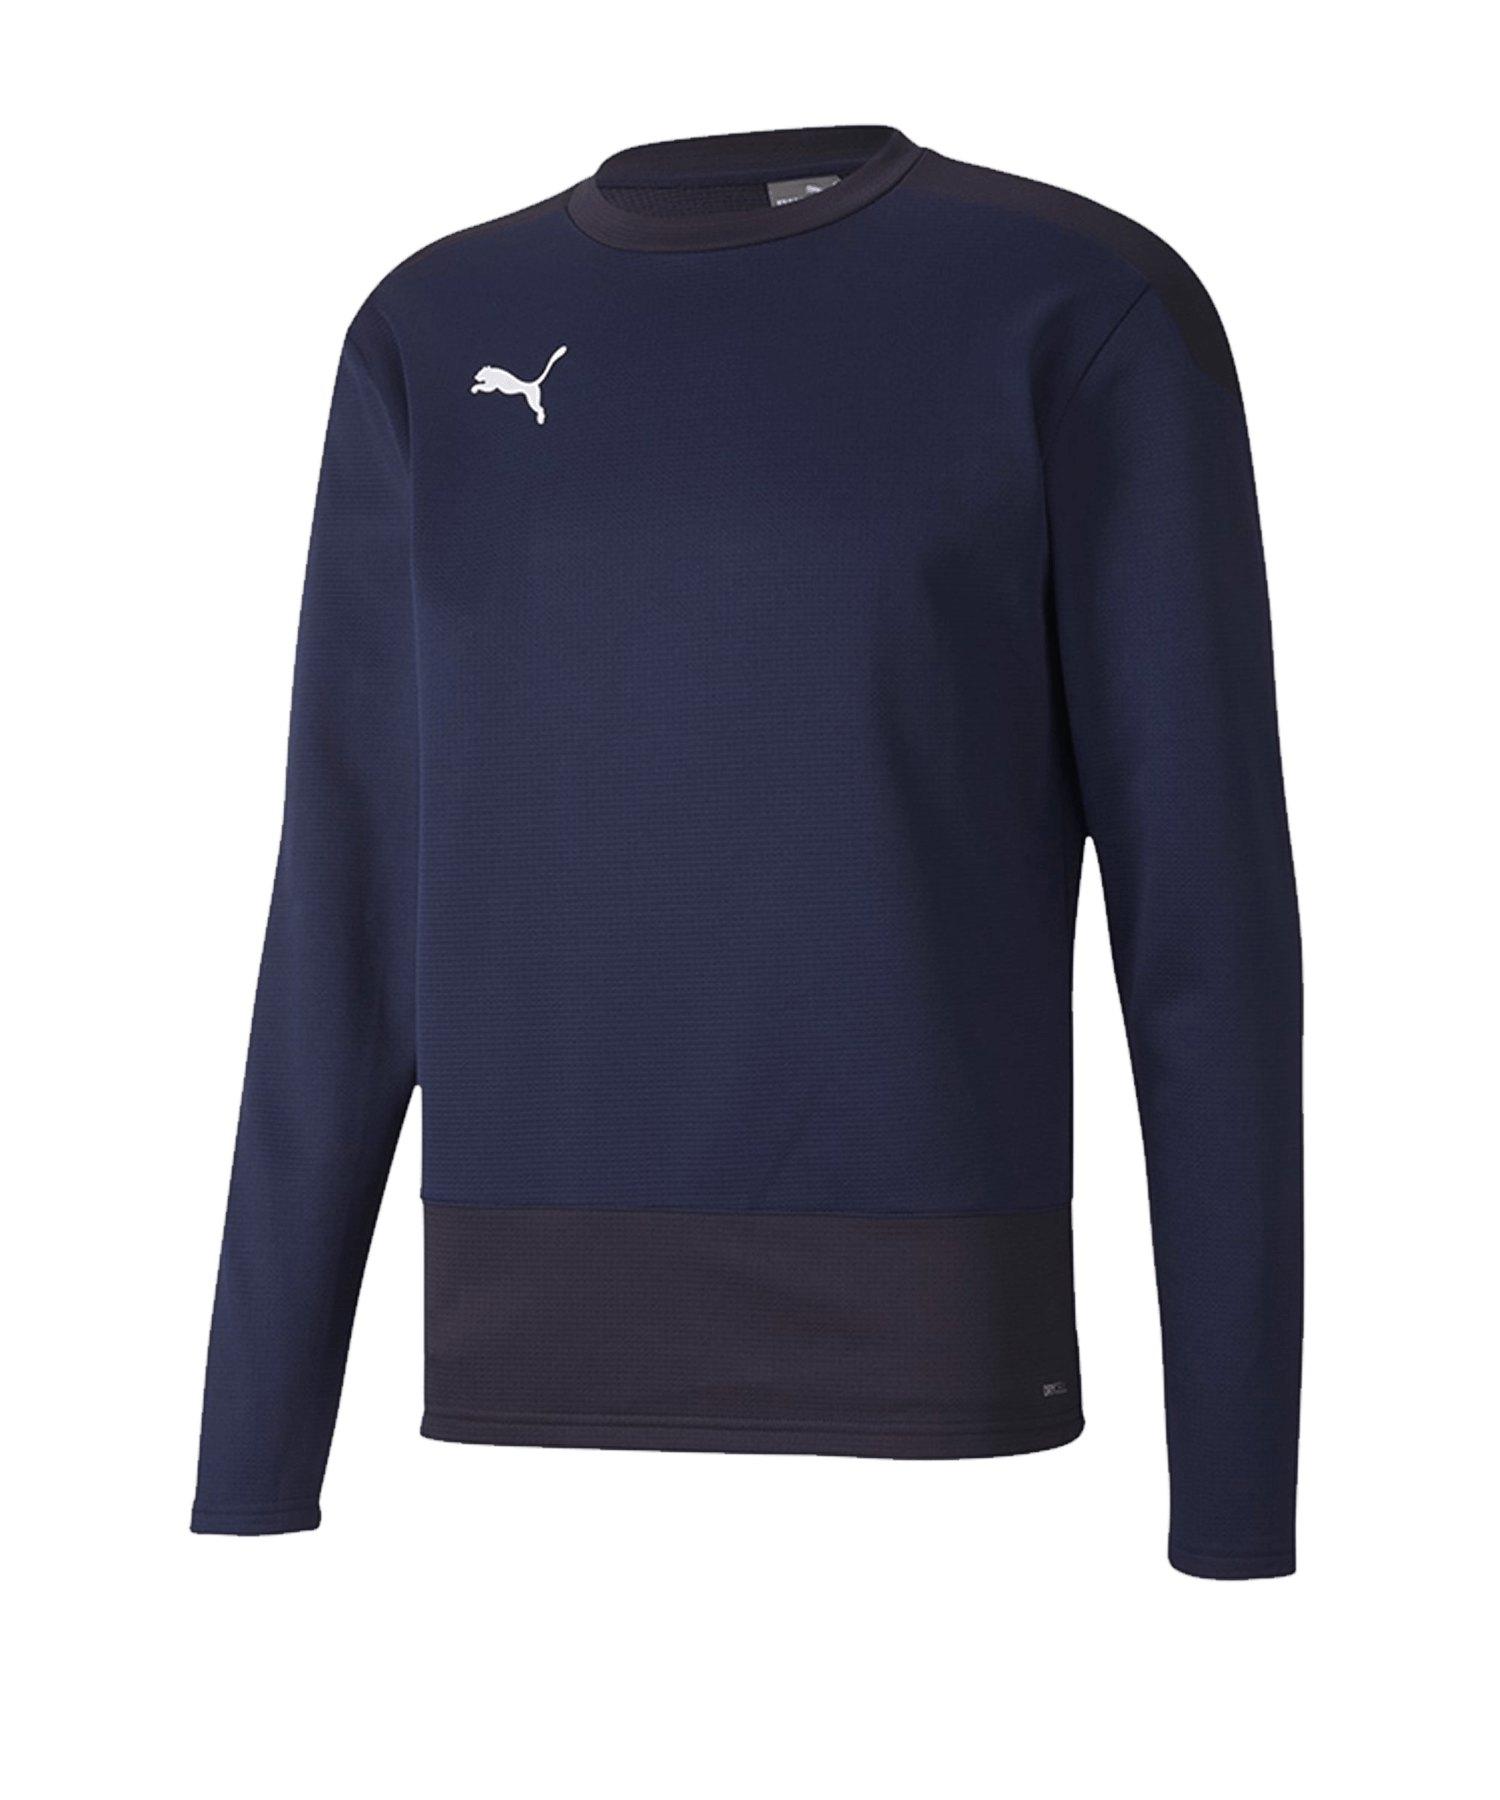 PUMA teamGOAL 23 Training Sweatshirt Blau F06 - blau